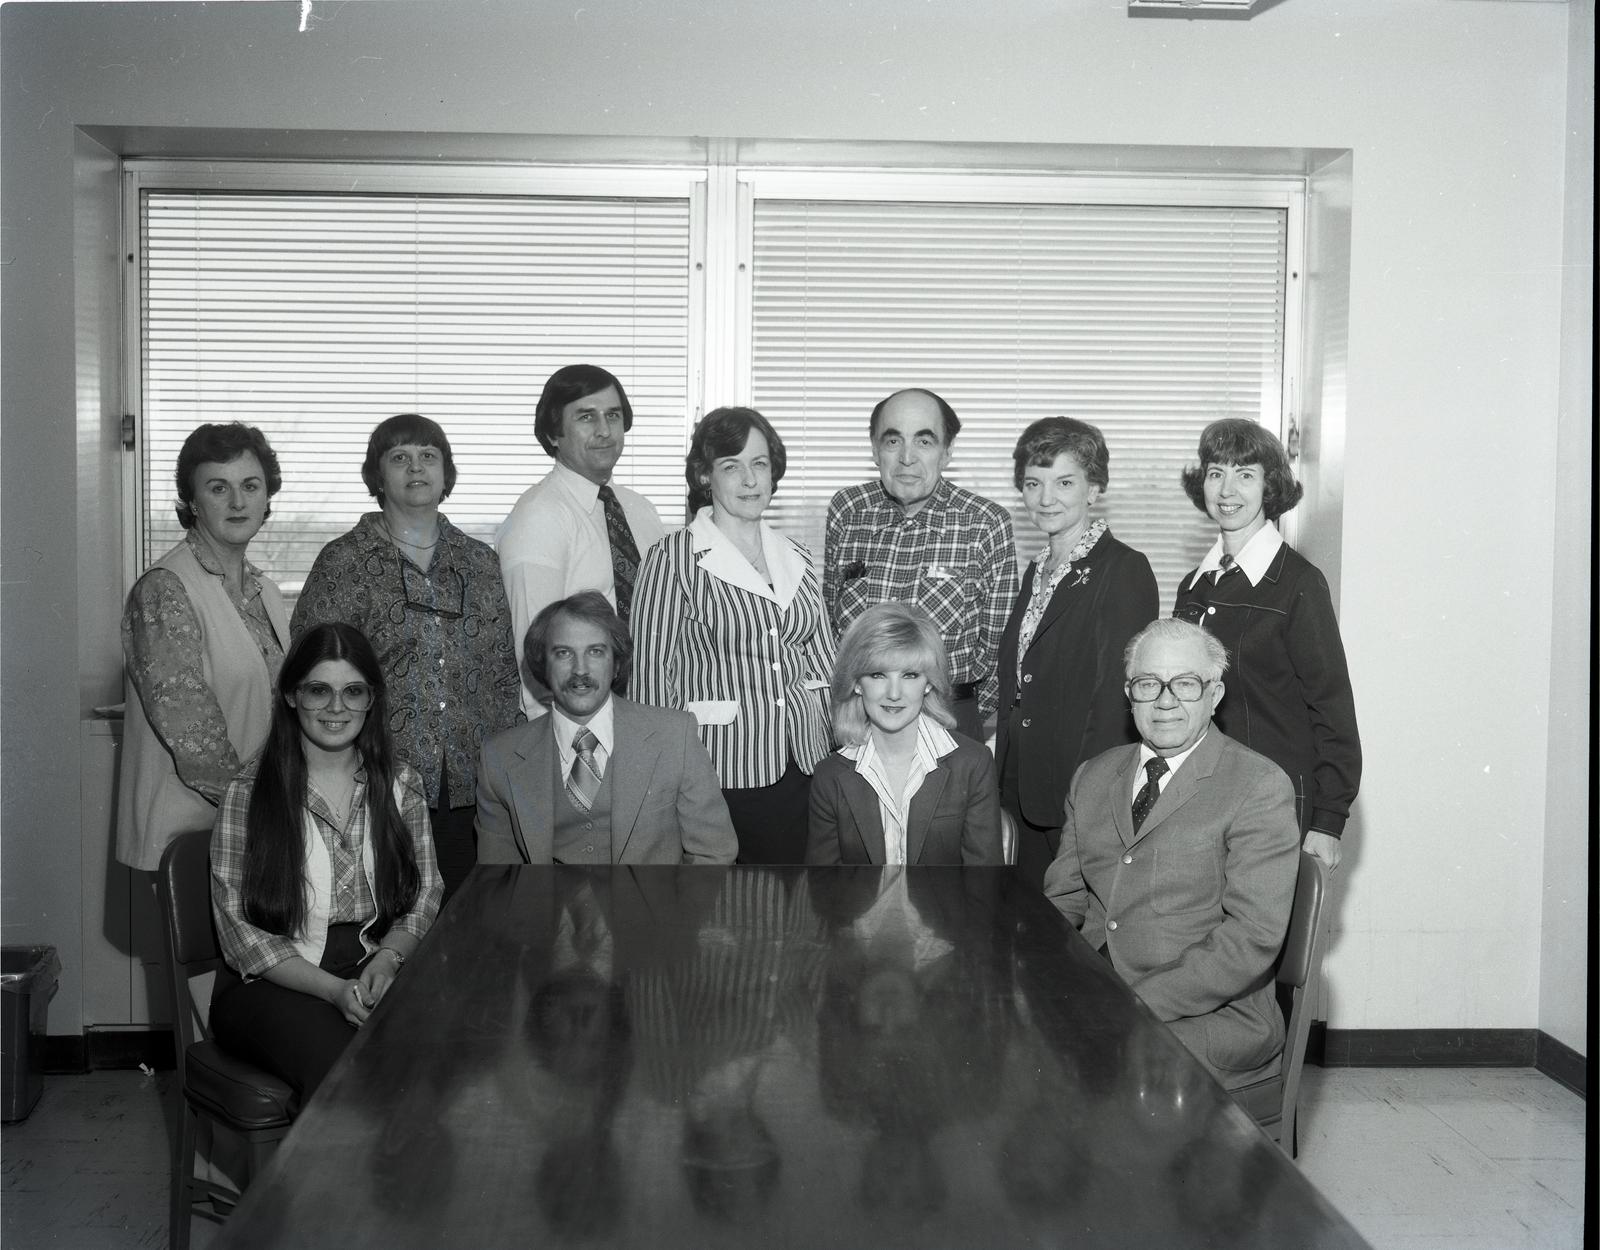 NASA LEWIS LLAMA CLUB OFFICERS